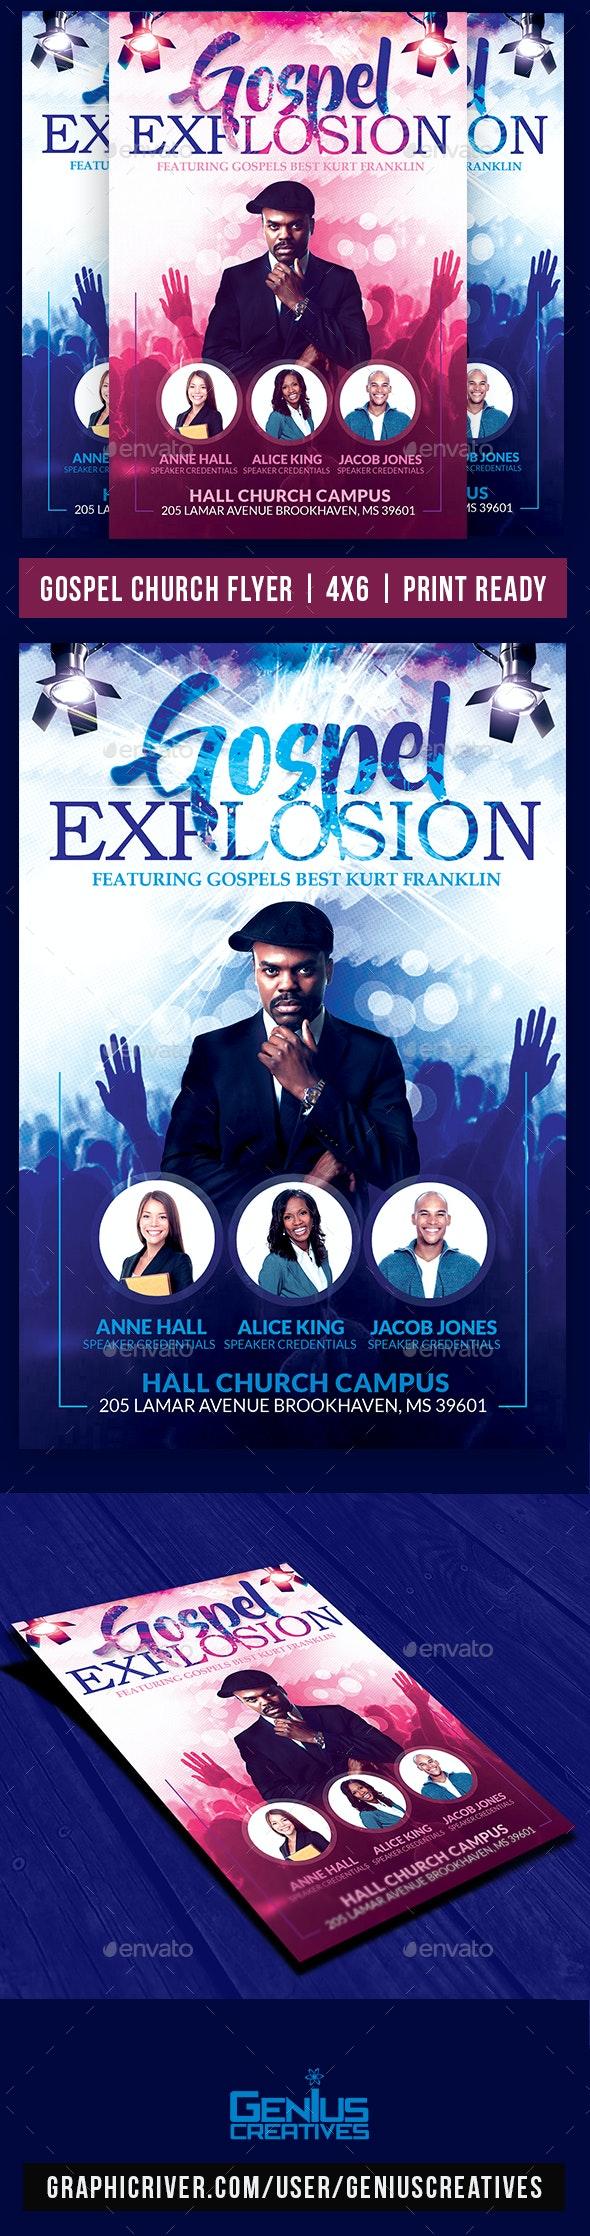 Gospel Explosion Church Flyer - Church Flyers